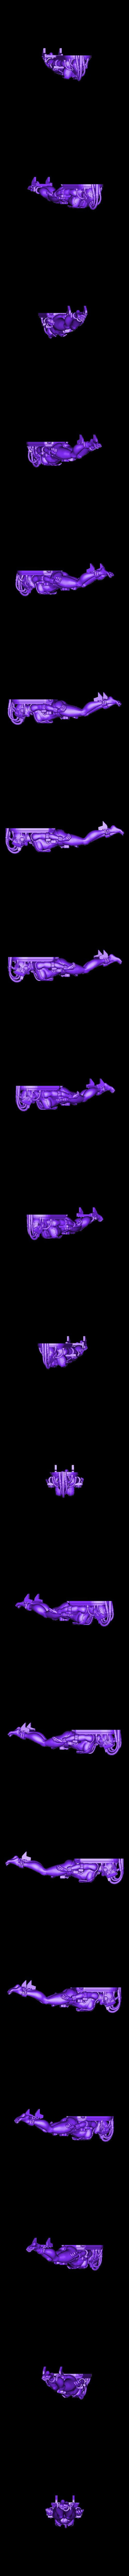 PennyBody 2.0.stl Download STL file Penny Nun Bot 2.0 • 3D print model, Leesedrenfort